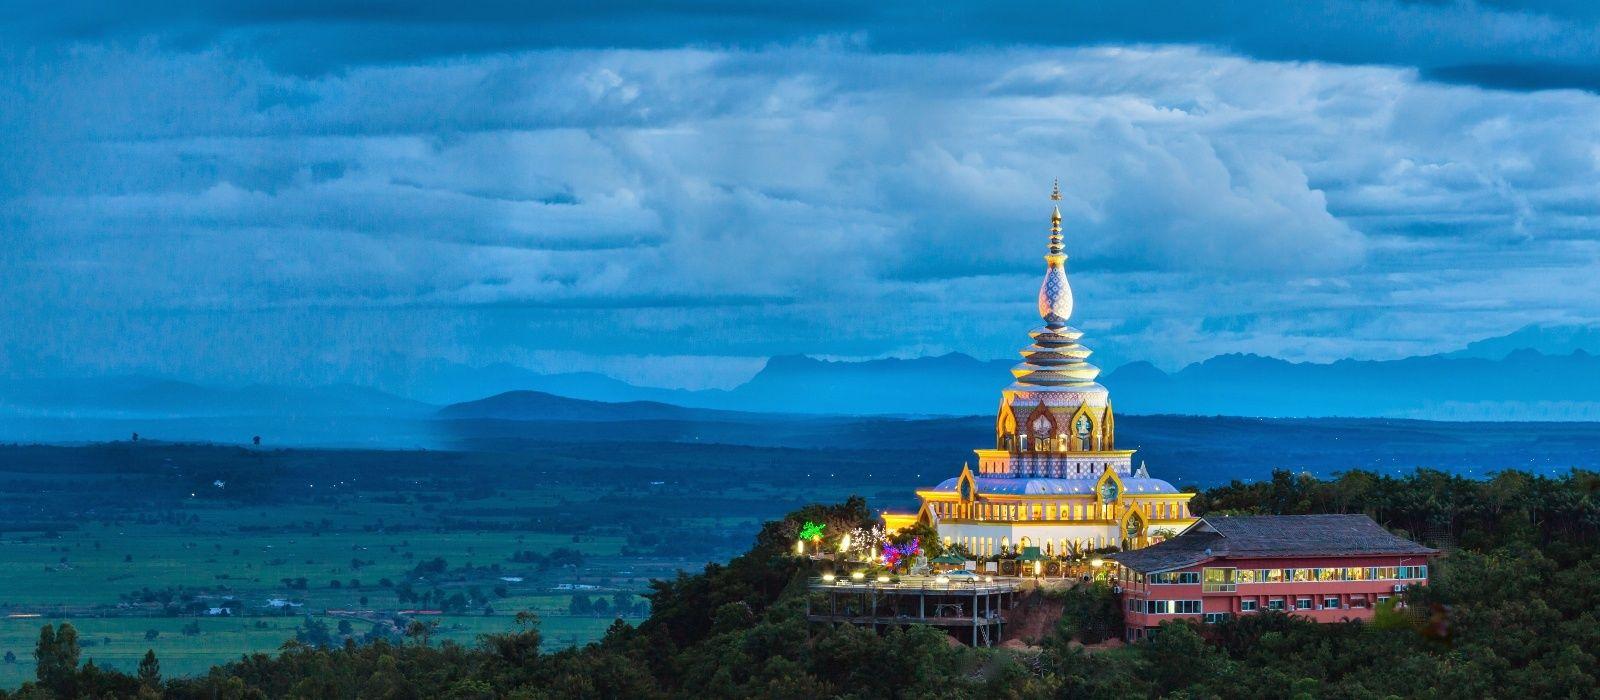 Chiang Mai - The Real Thailand